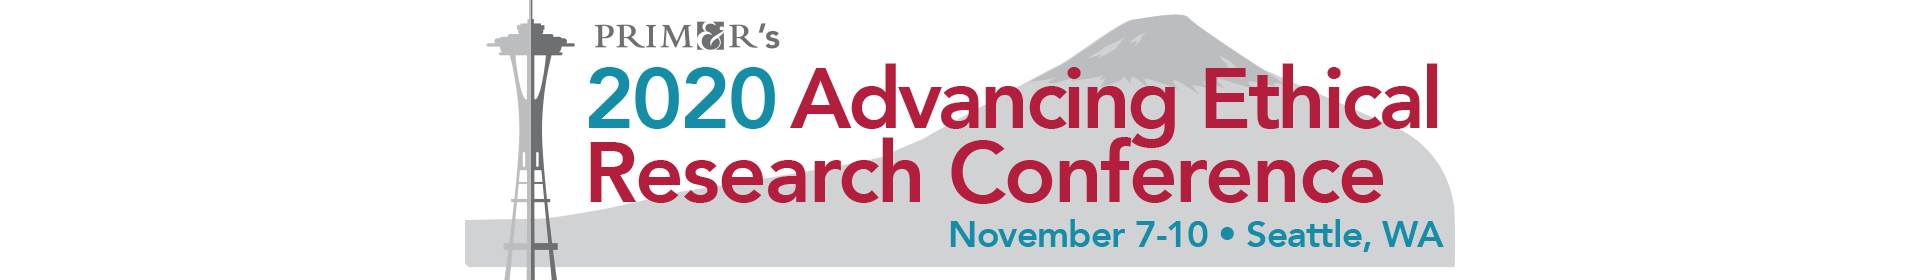 AER 2020 Event Banner